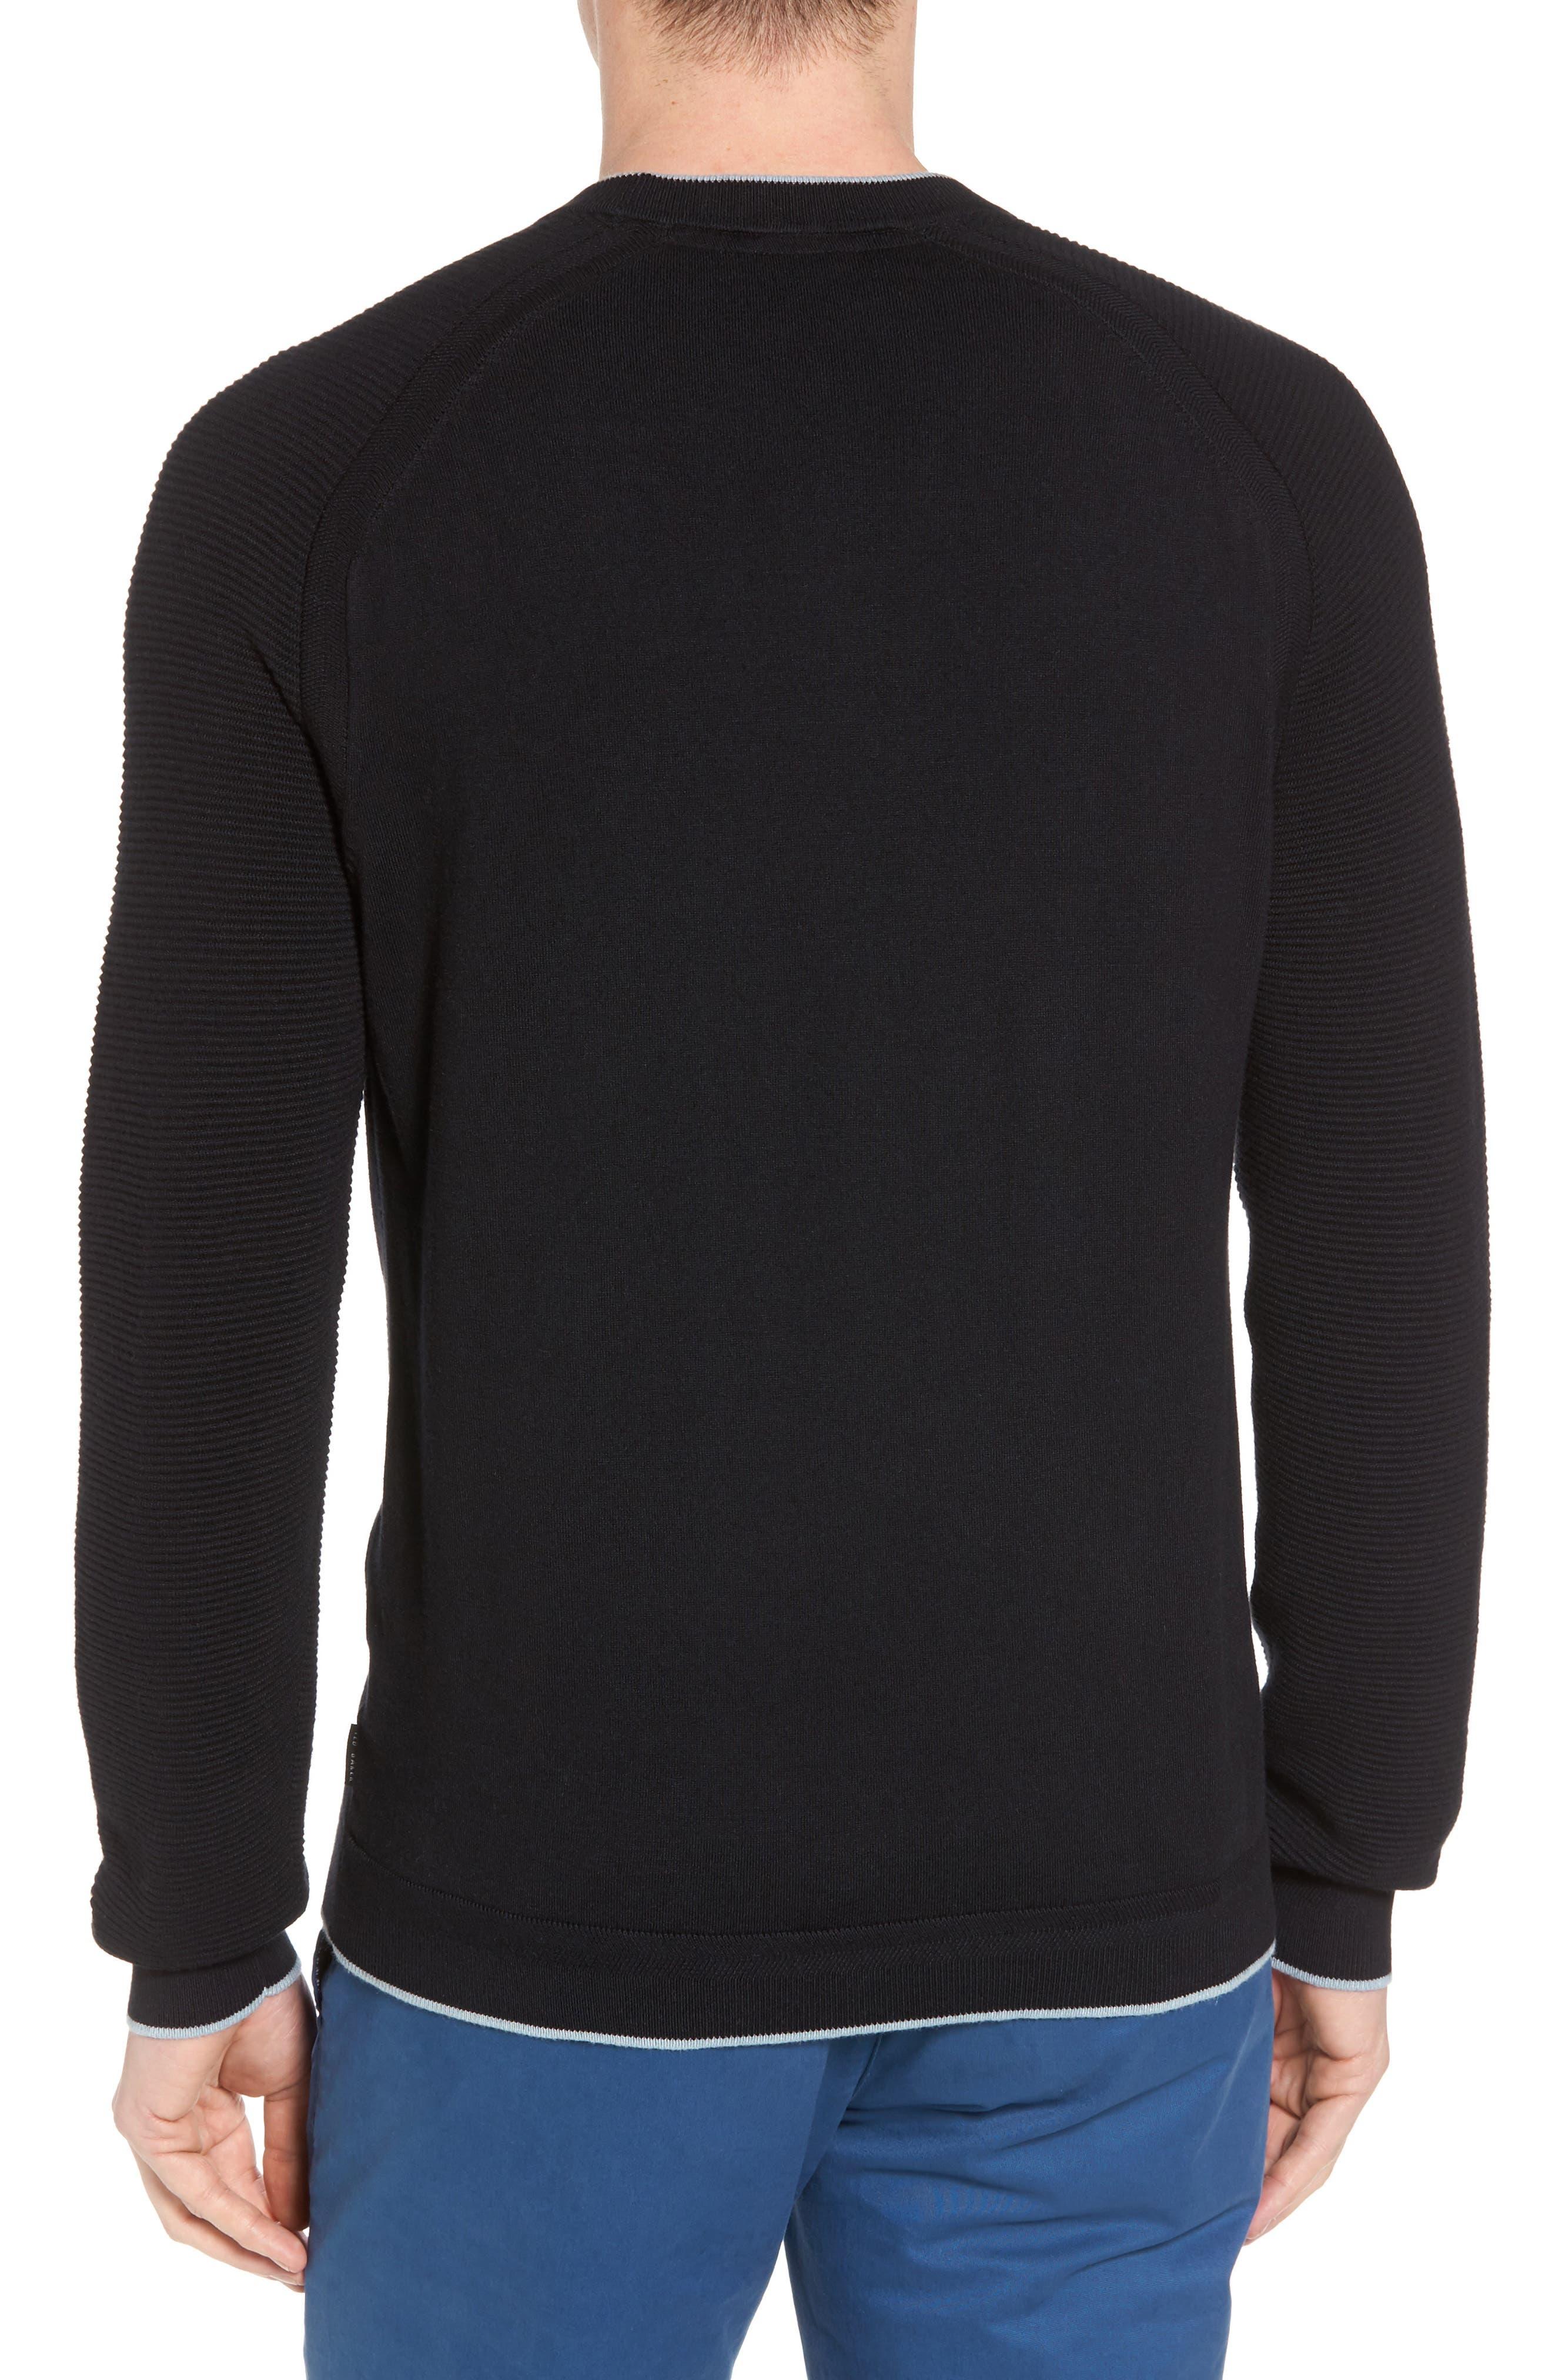 Kayfed Rib Sleeve Sweater,                             Alternate thumbnail 2, color,                             001